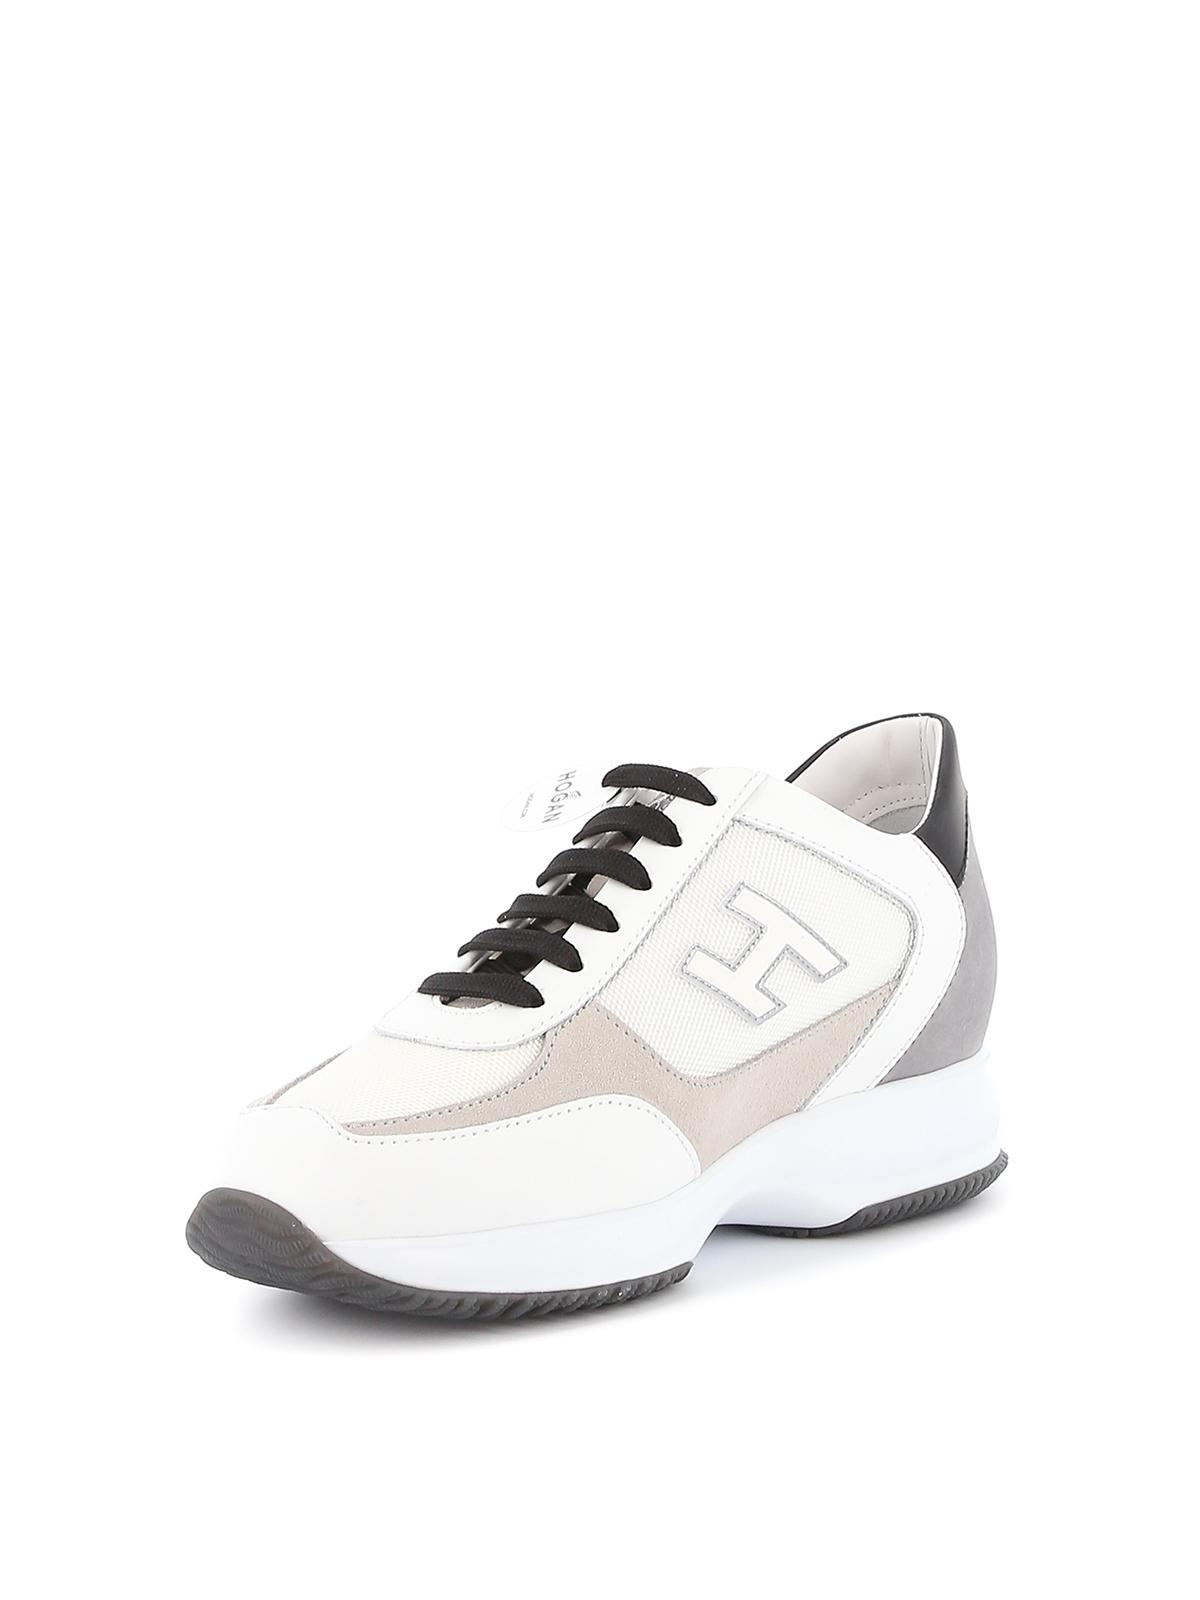 Hogan - New Interactive sneakers